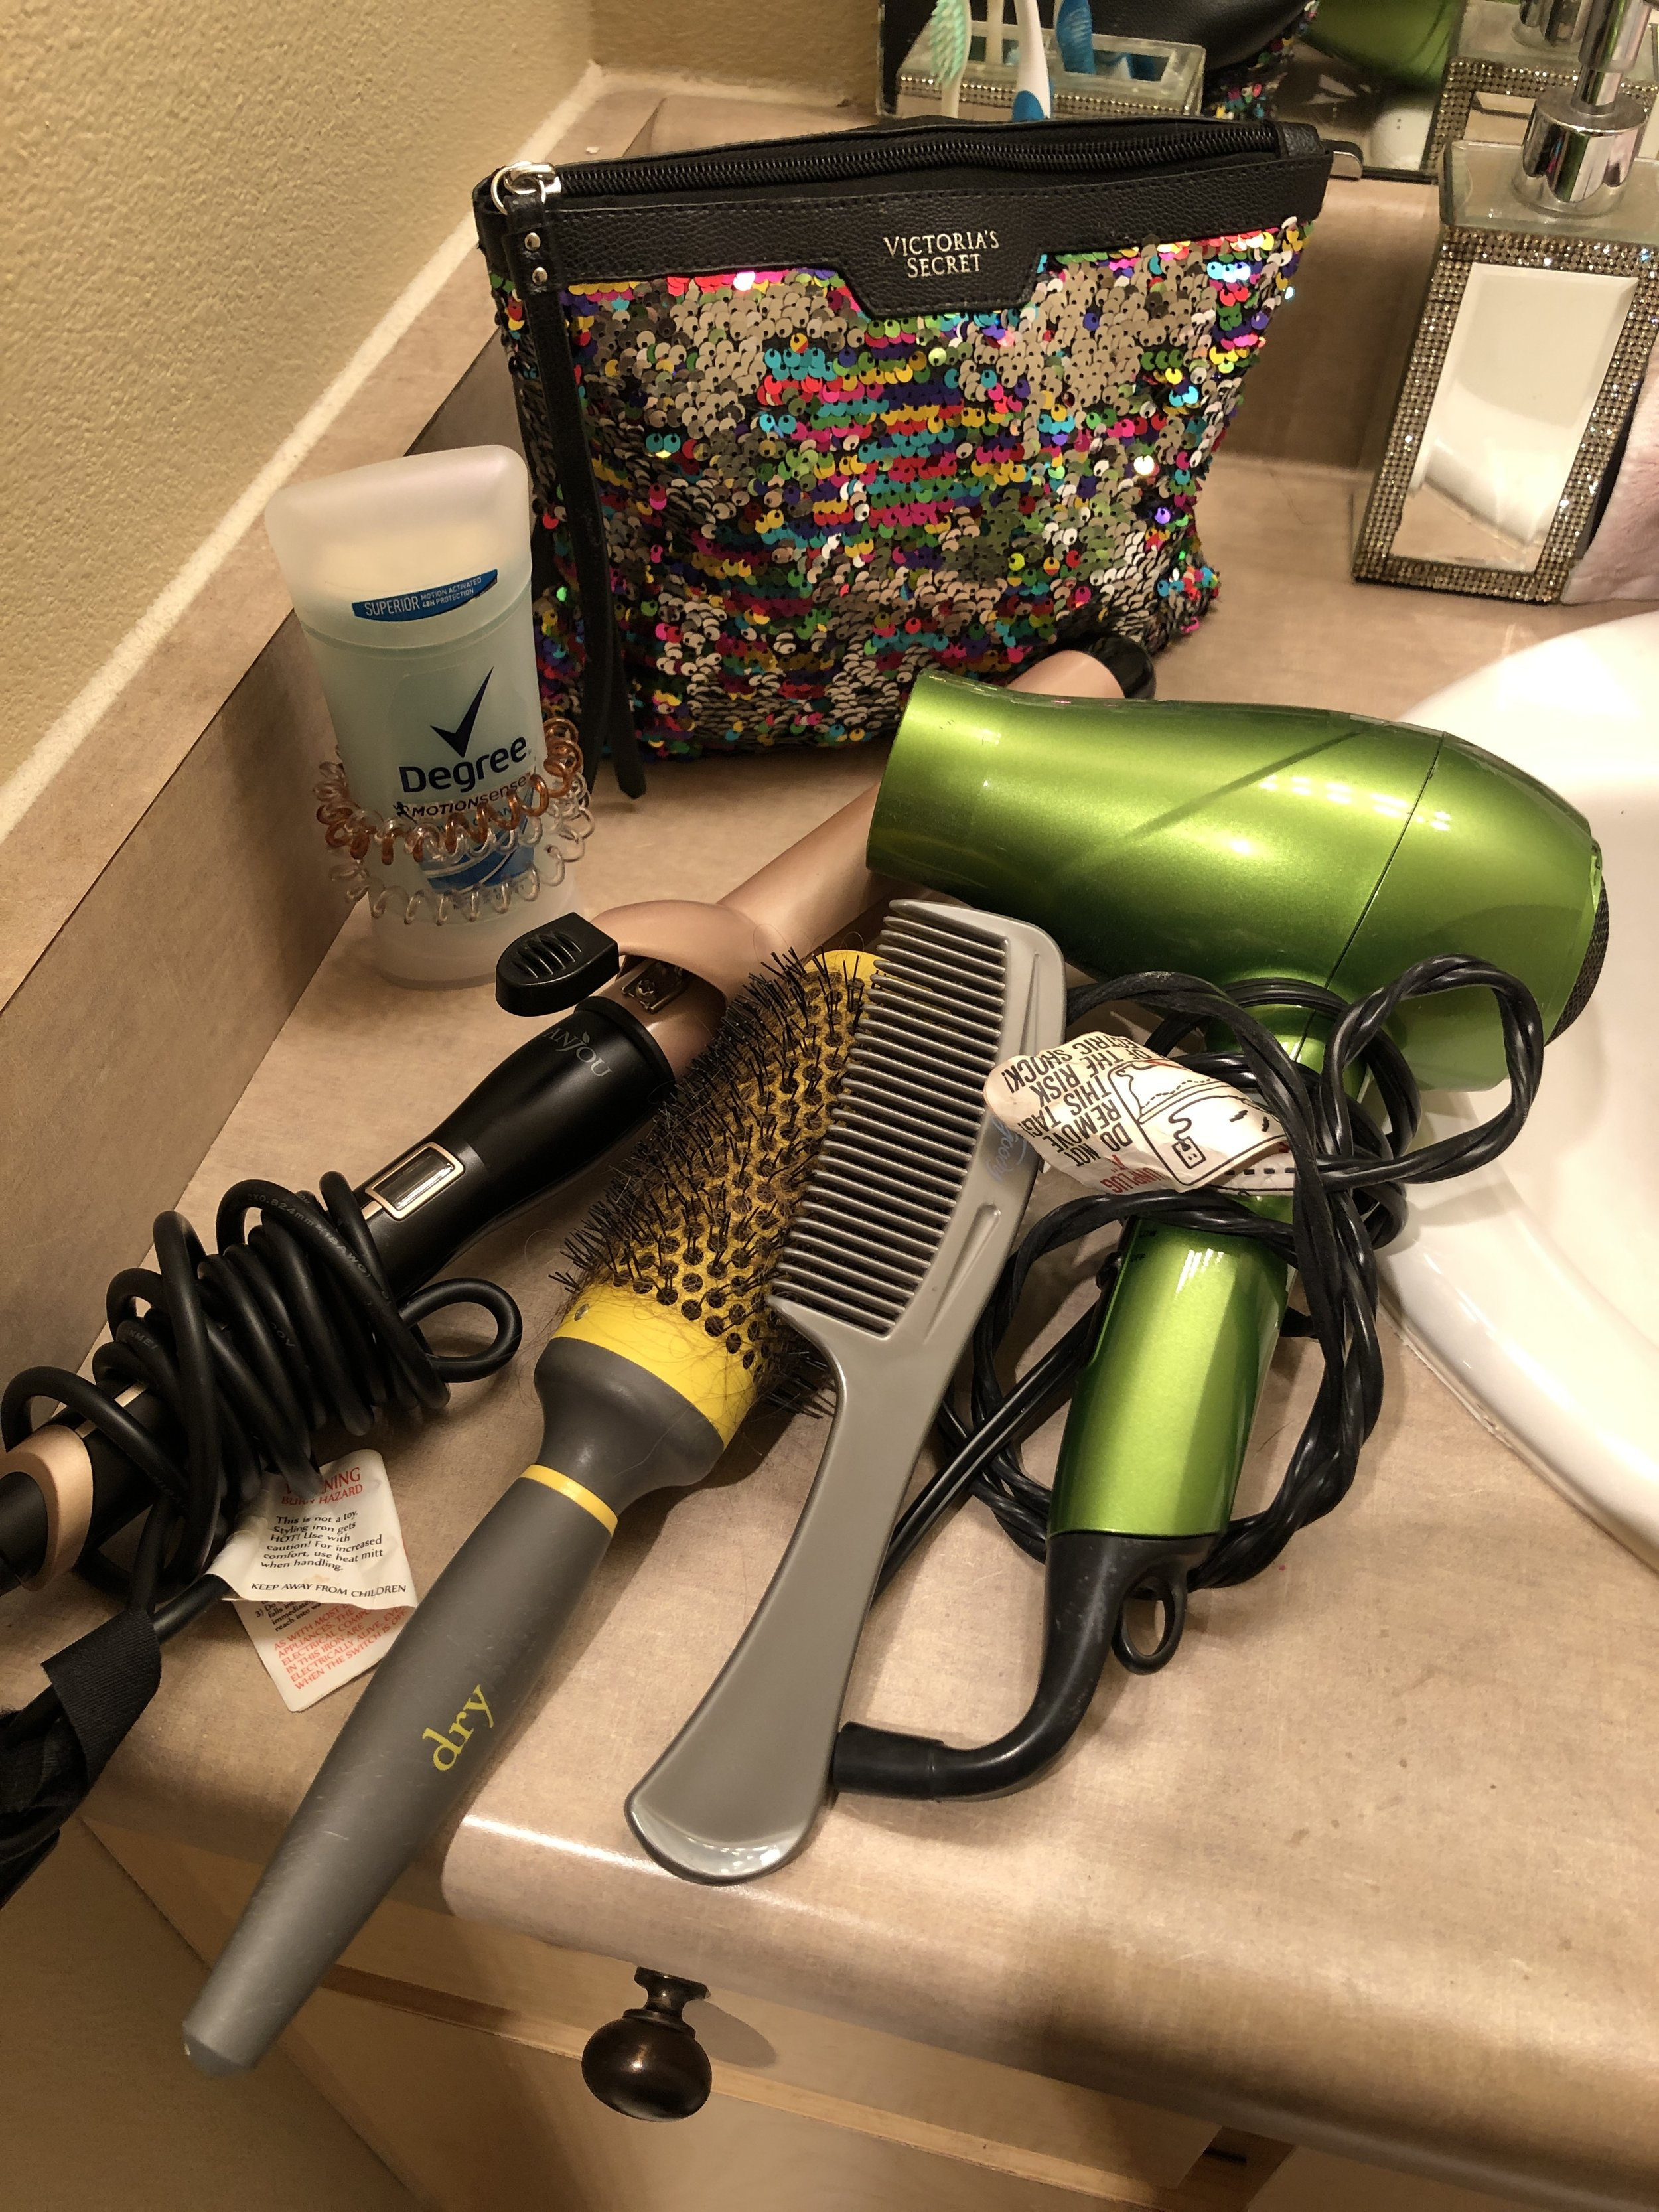 Degree deodorant curling iron Round Brush Comb Hair dryer